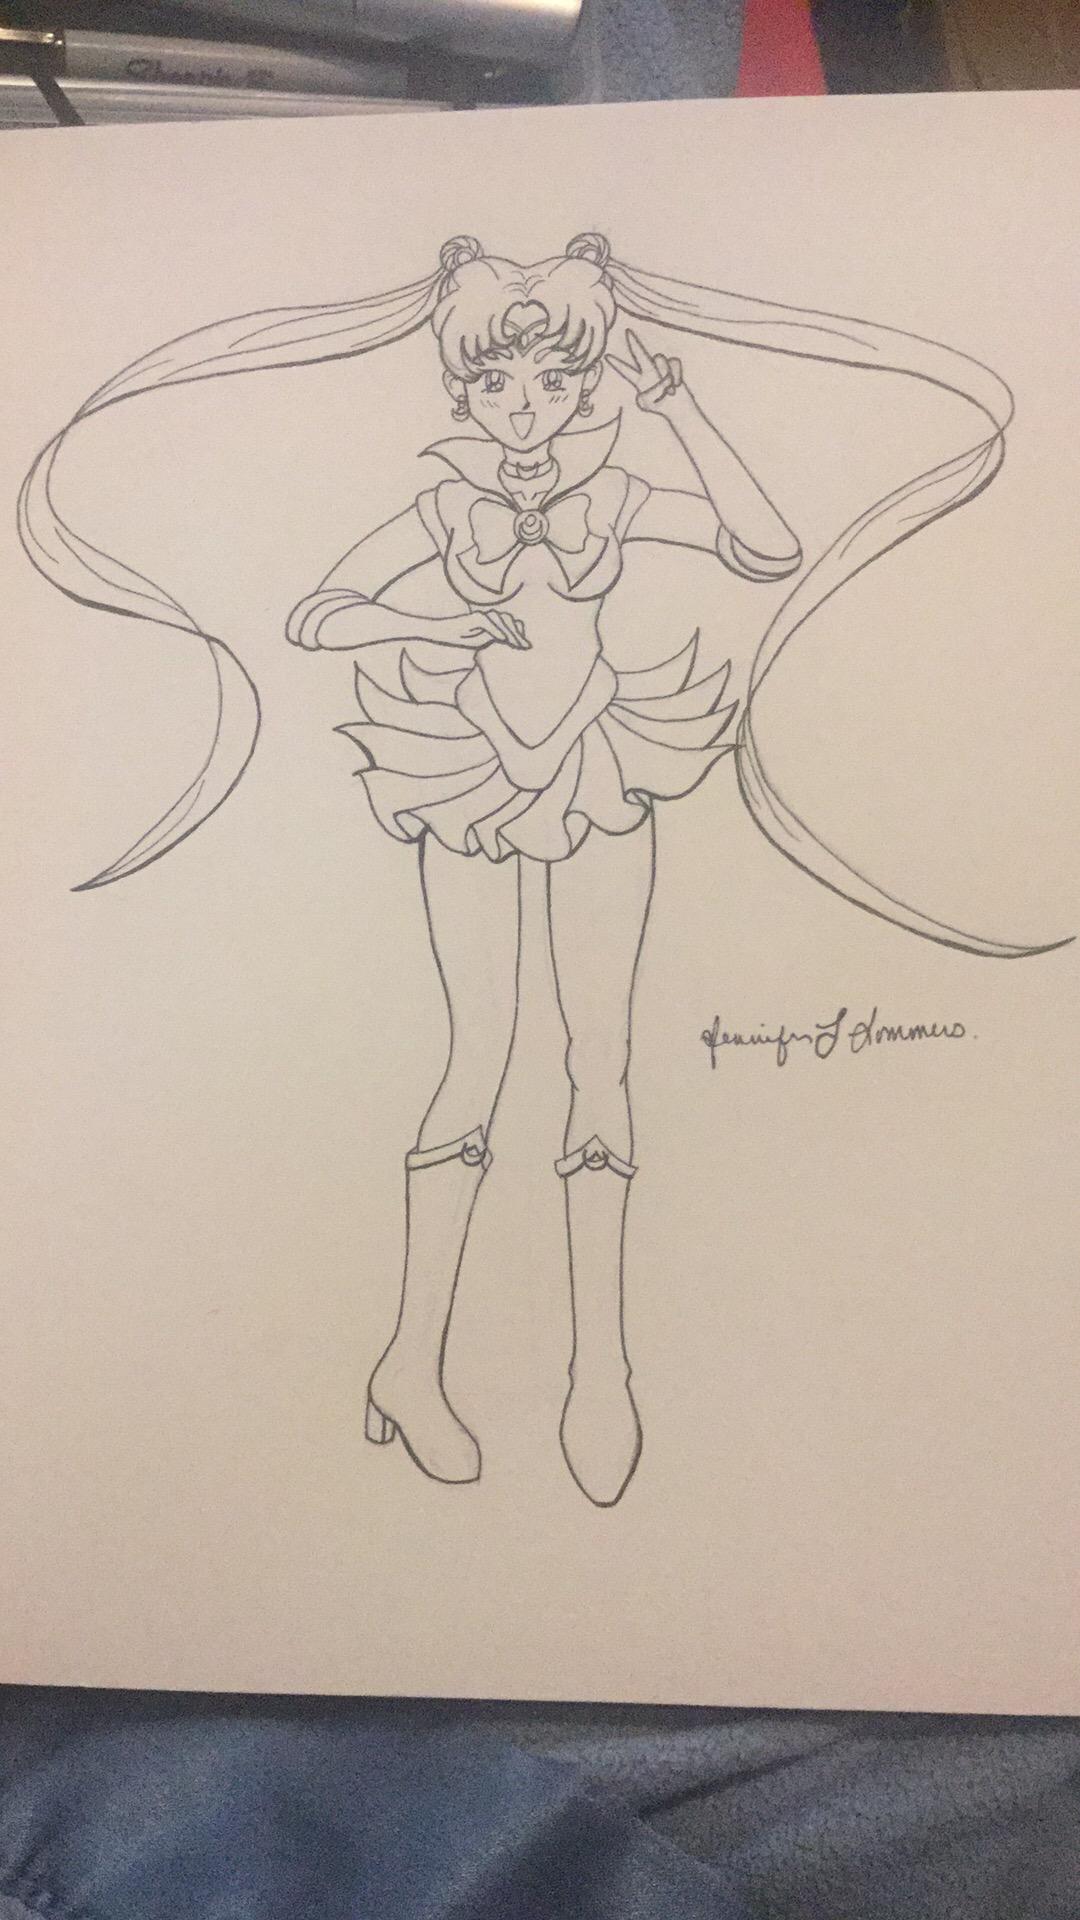 Sailor Moon line work